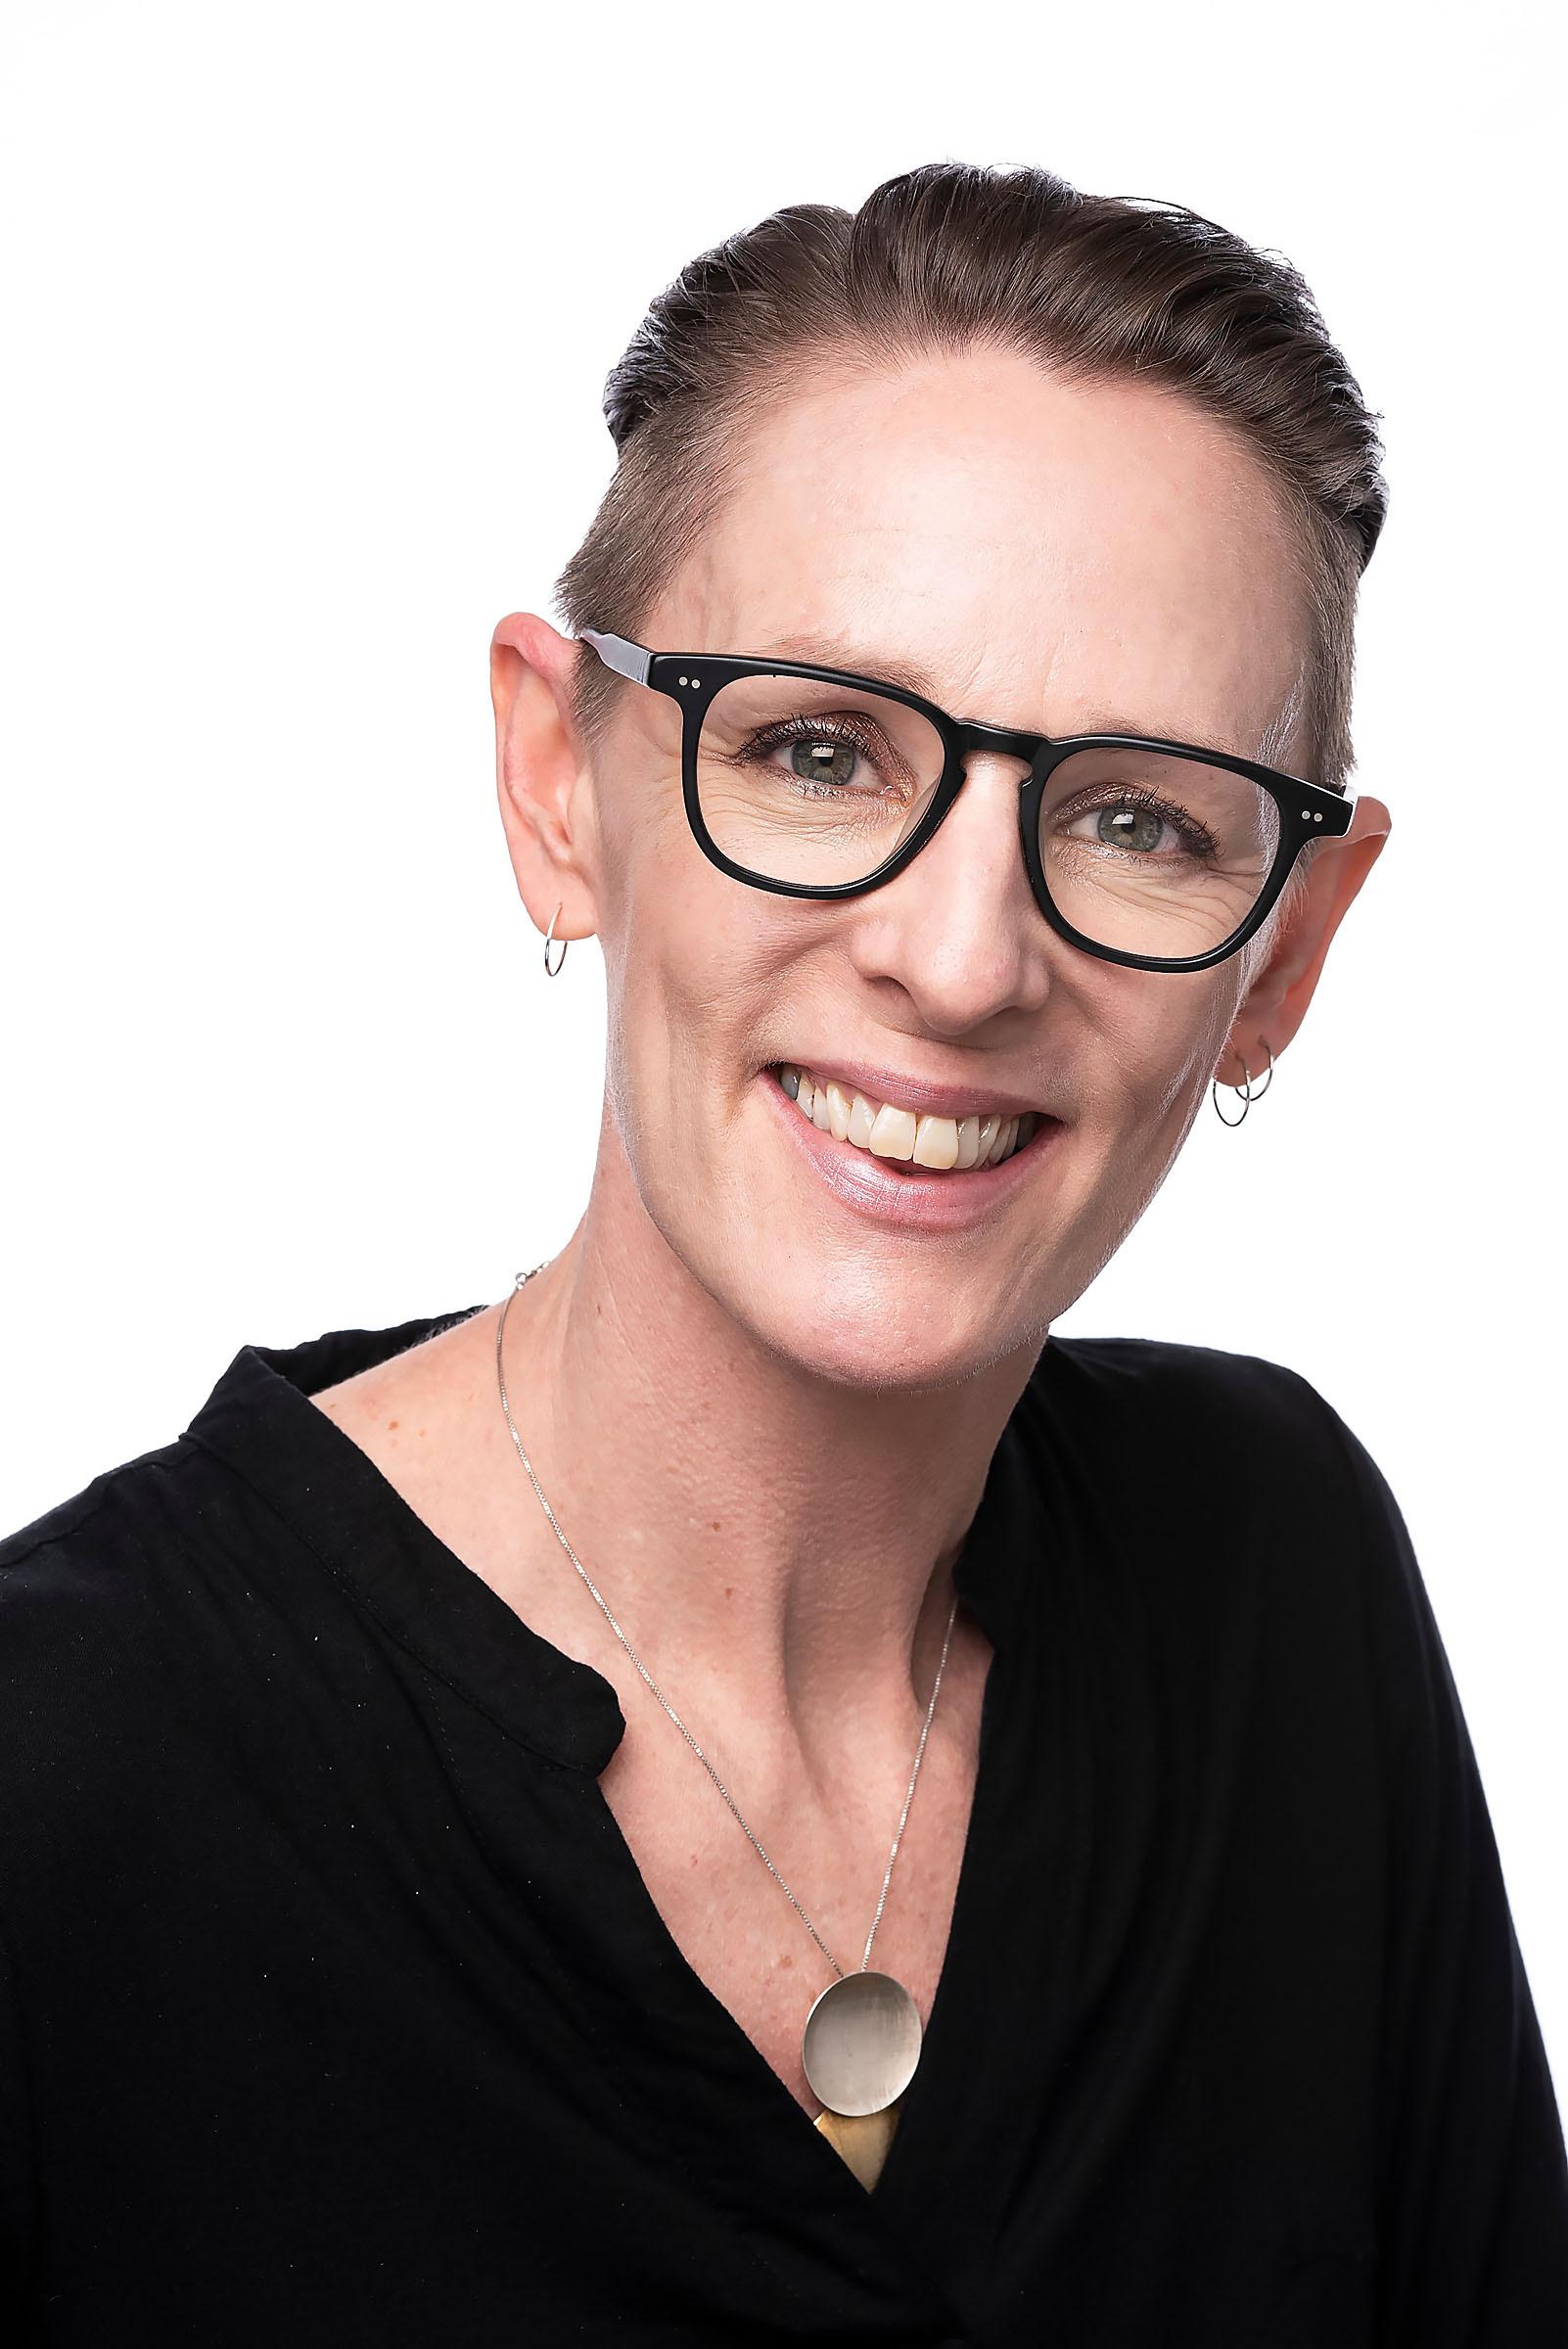 Profile picture of Sarah Maddison